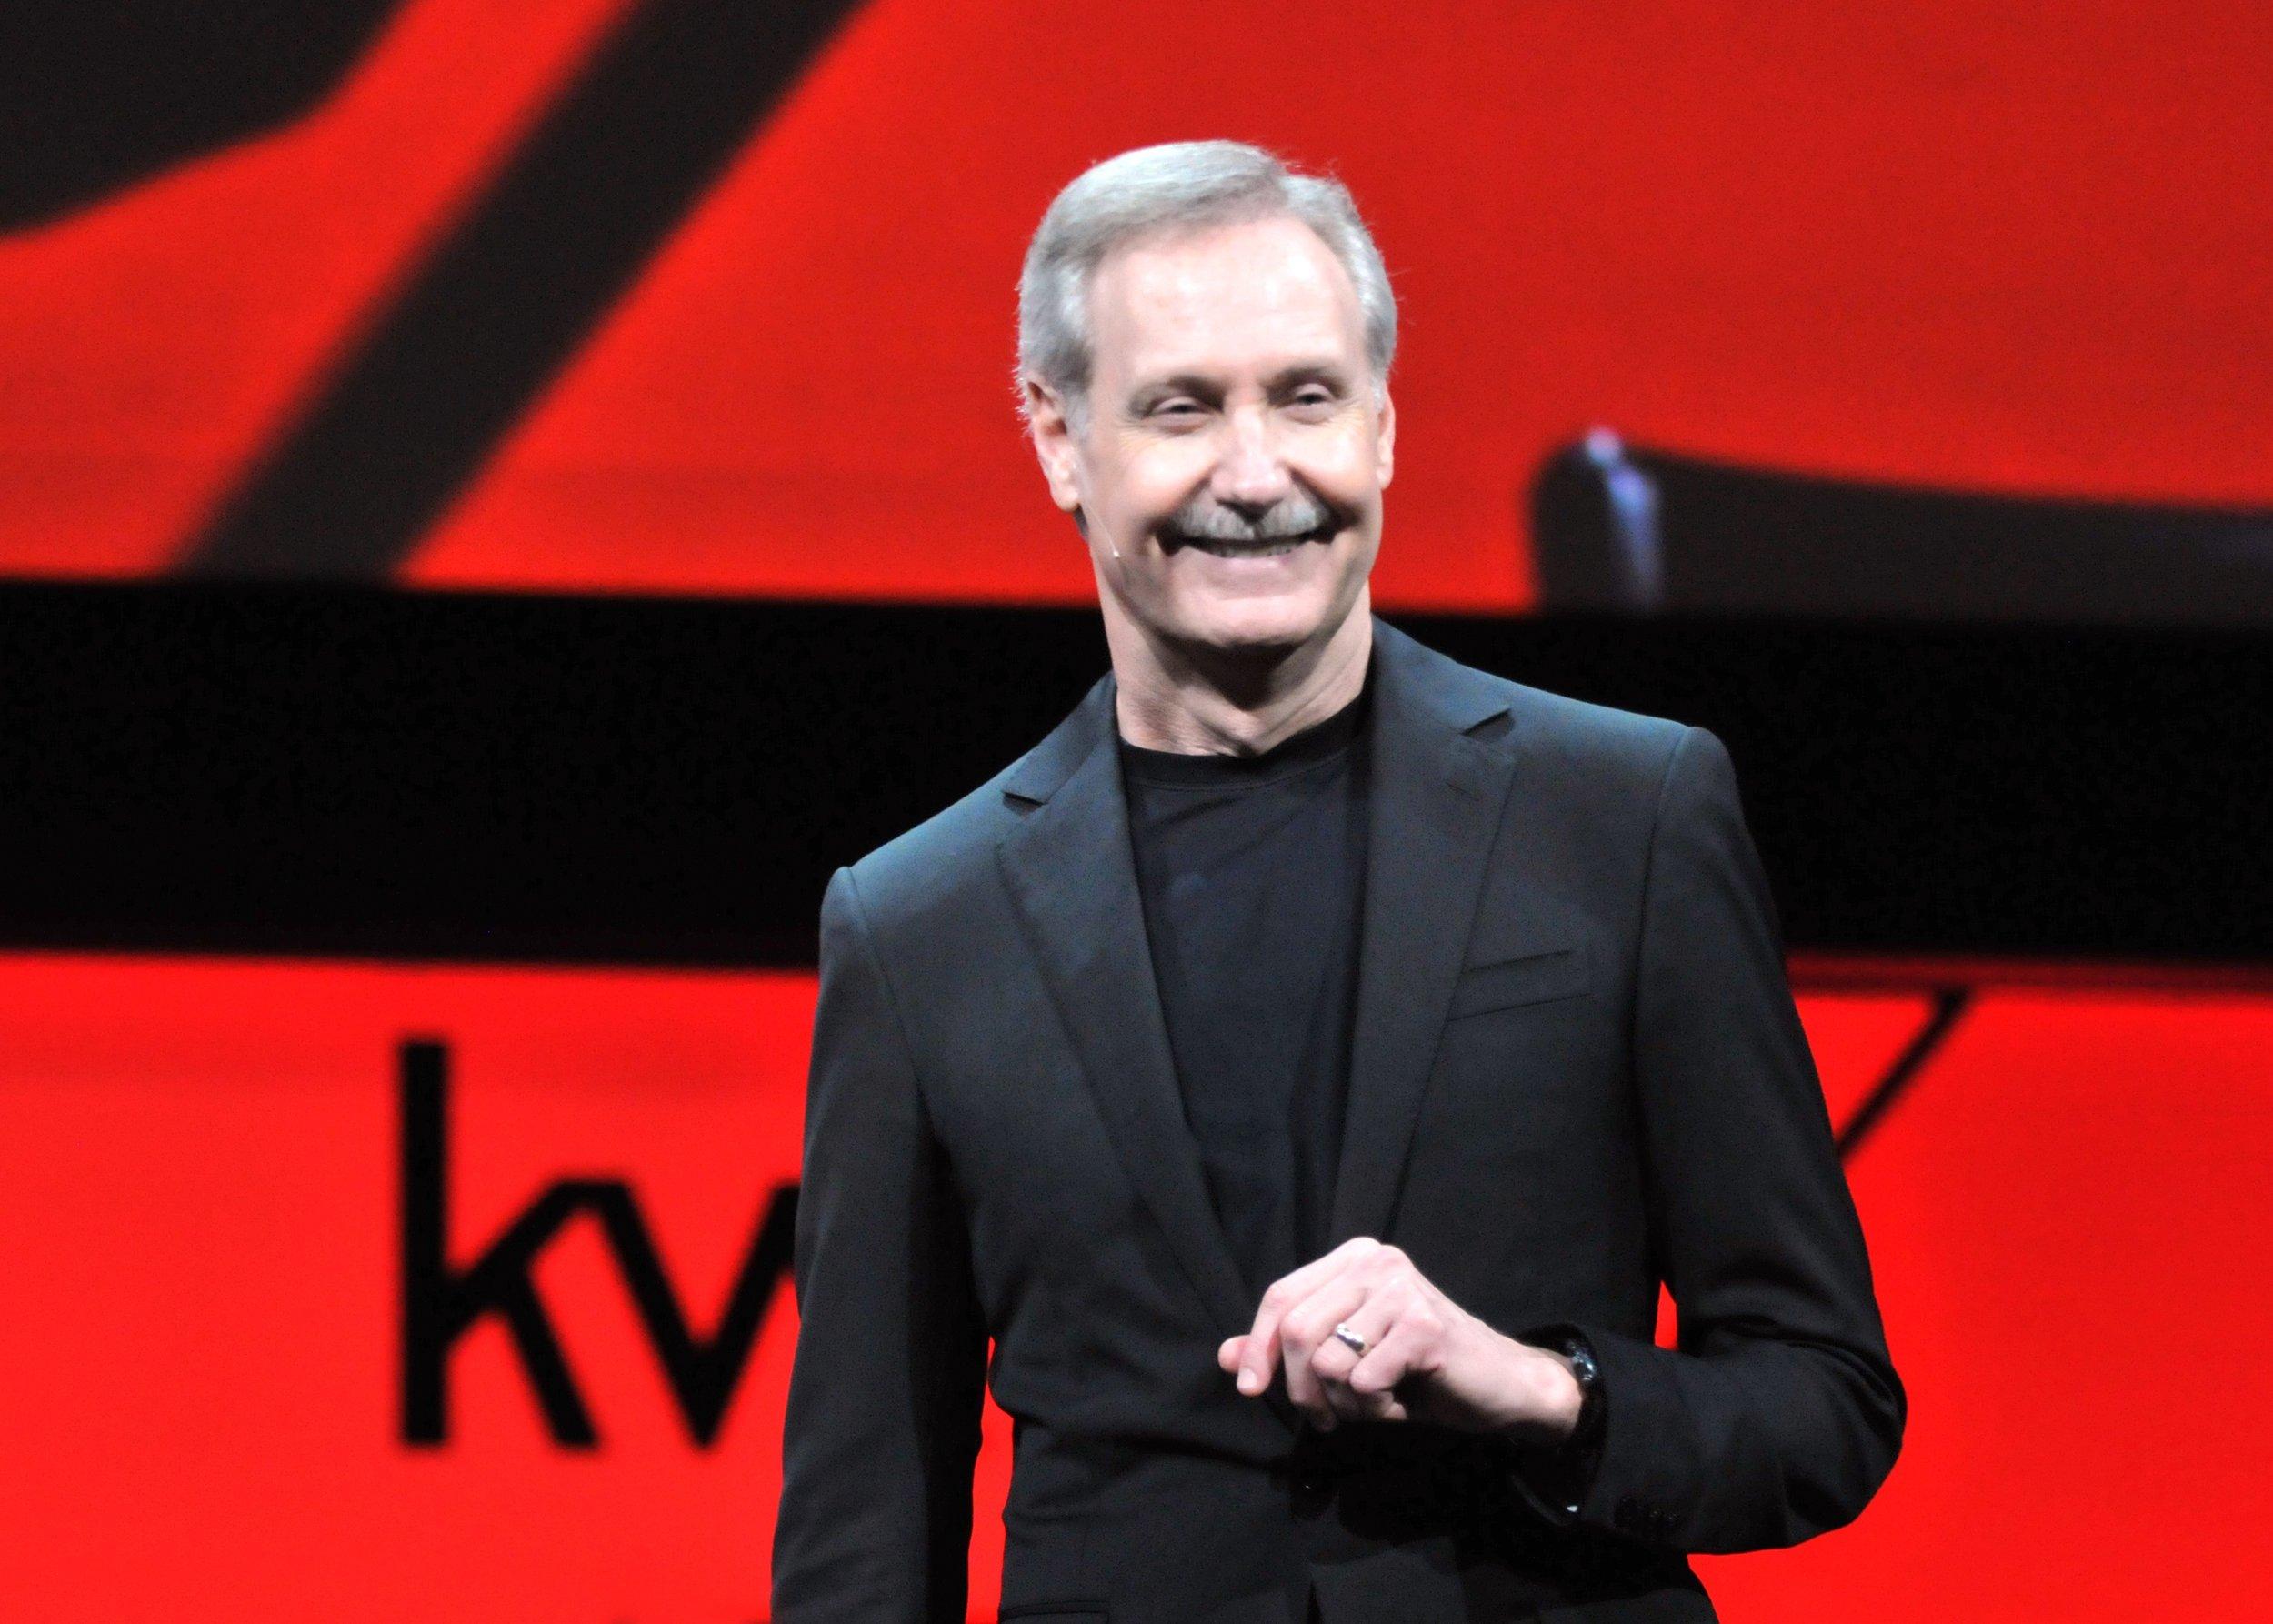 Gary Keller